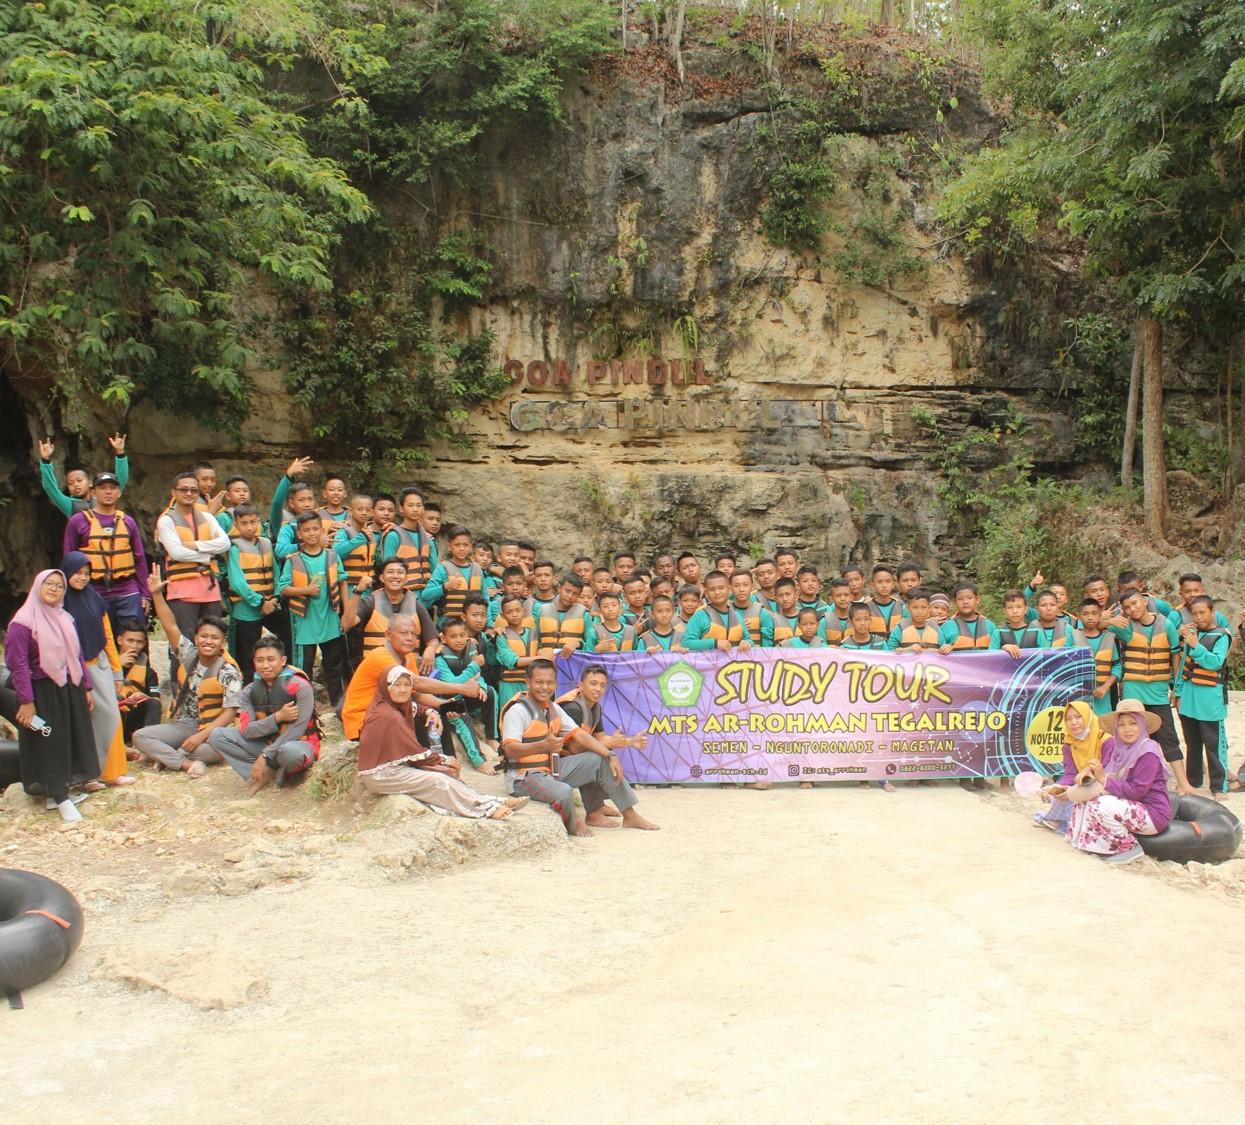 Assalamu Alaikum Jogja Study Tour Siswa Kelas 8 Mts Ar Rohman Tegalrejo Mts Ar Rohman Tegalrejo